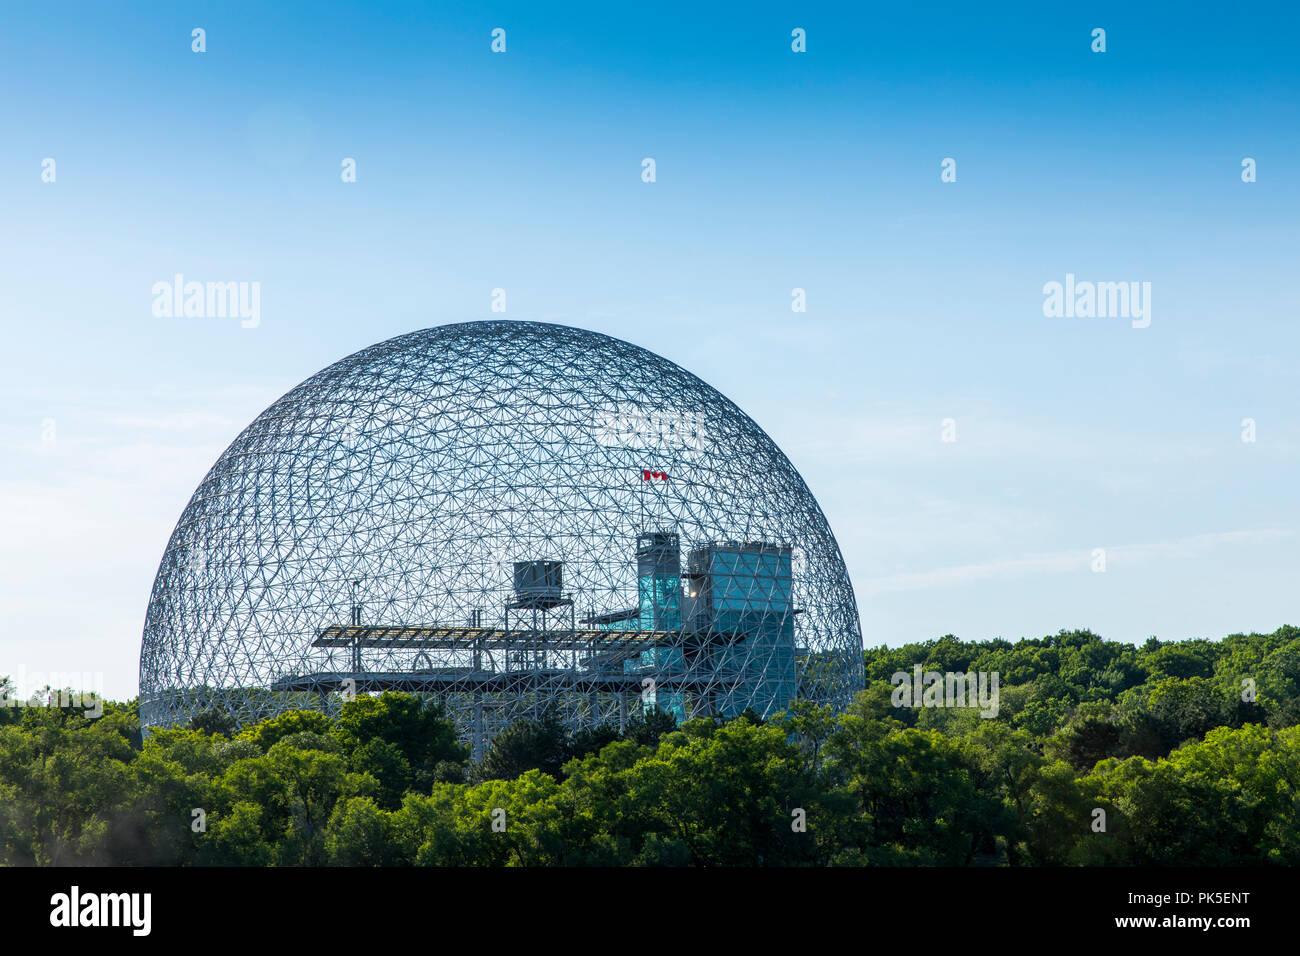 Canada,Quebec,Montreal, Biosphere - Stock Image